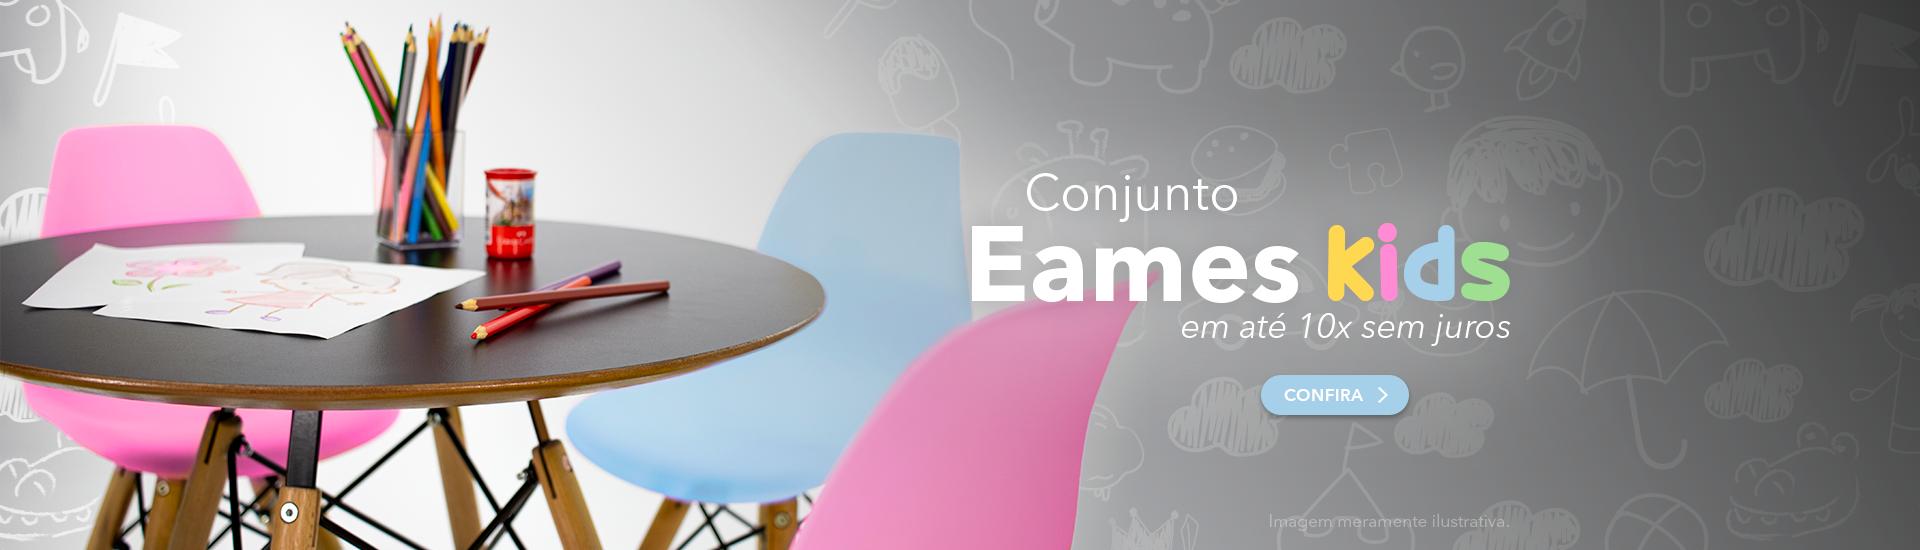 Banner Conjunto Eames Kids